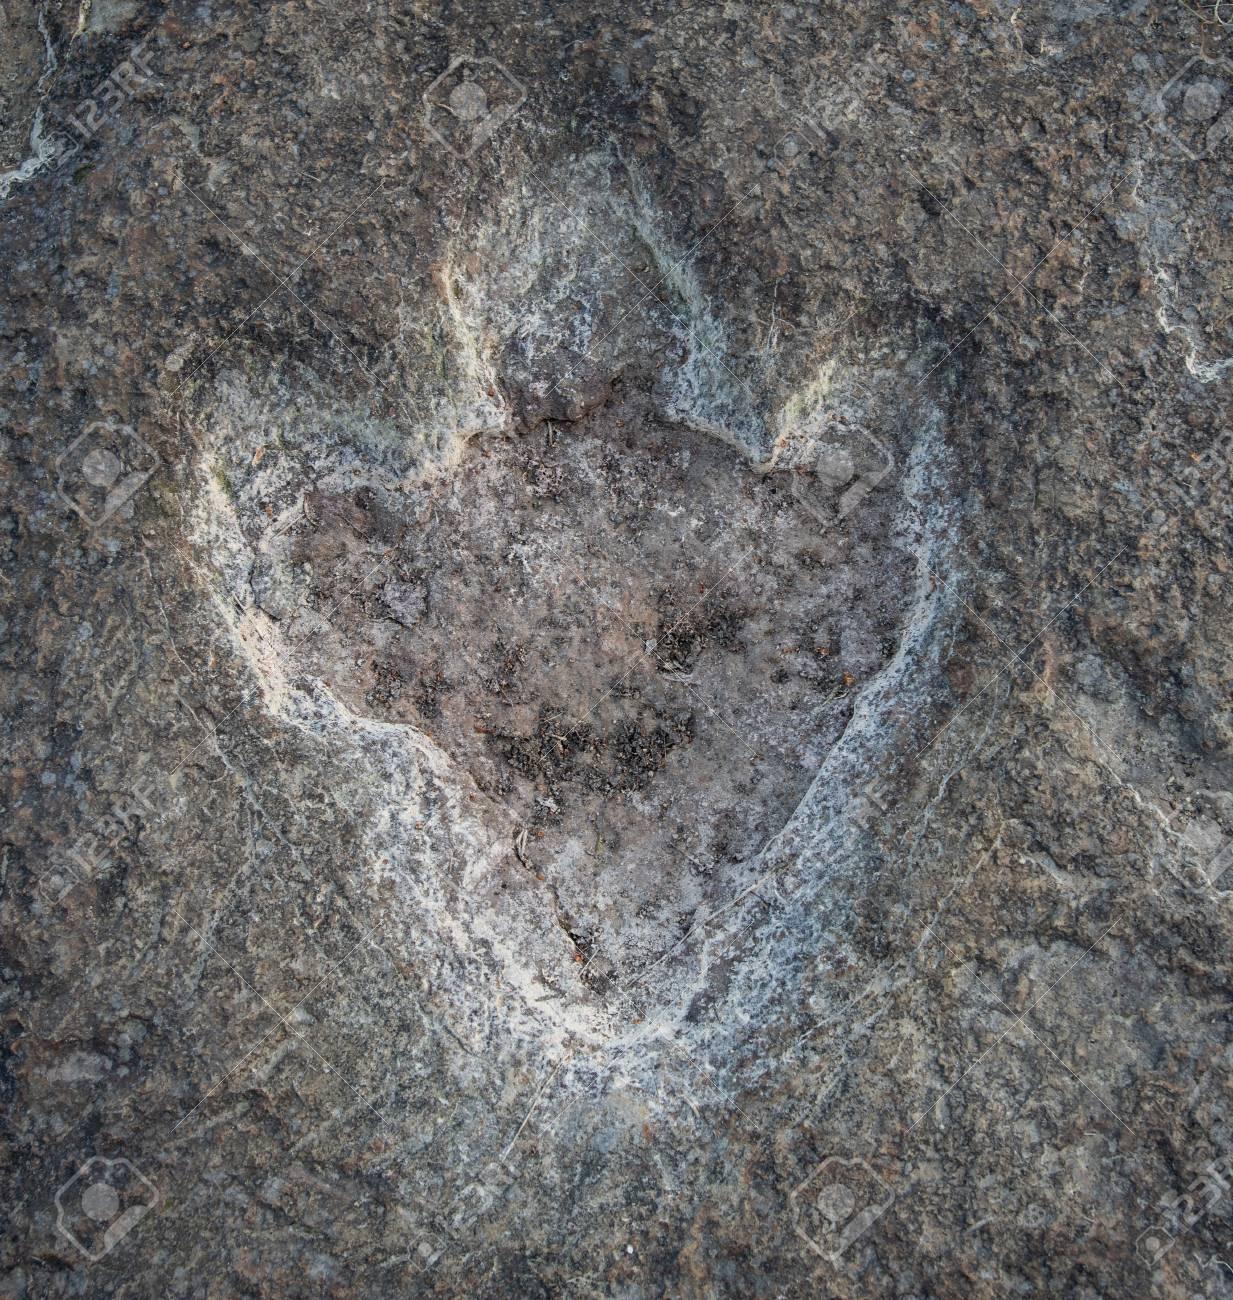 The footprints of dinosaur on a stone . - 117911270